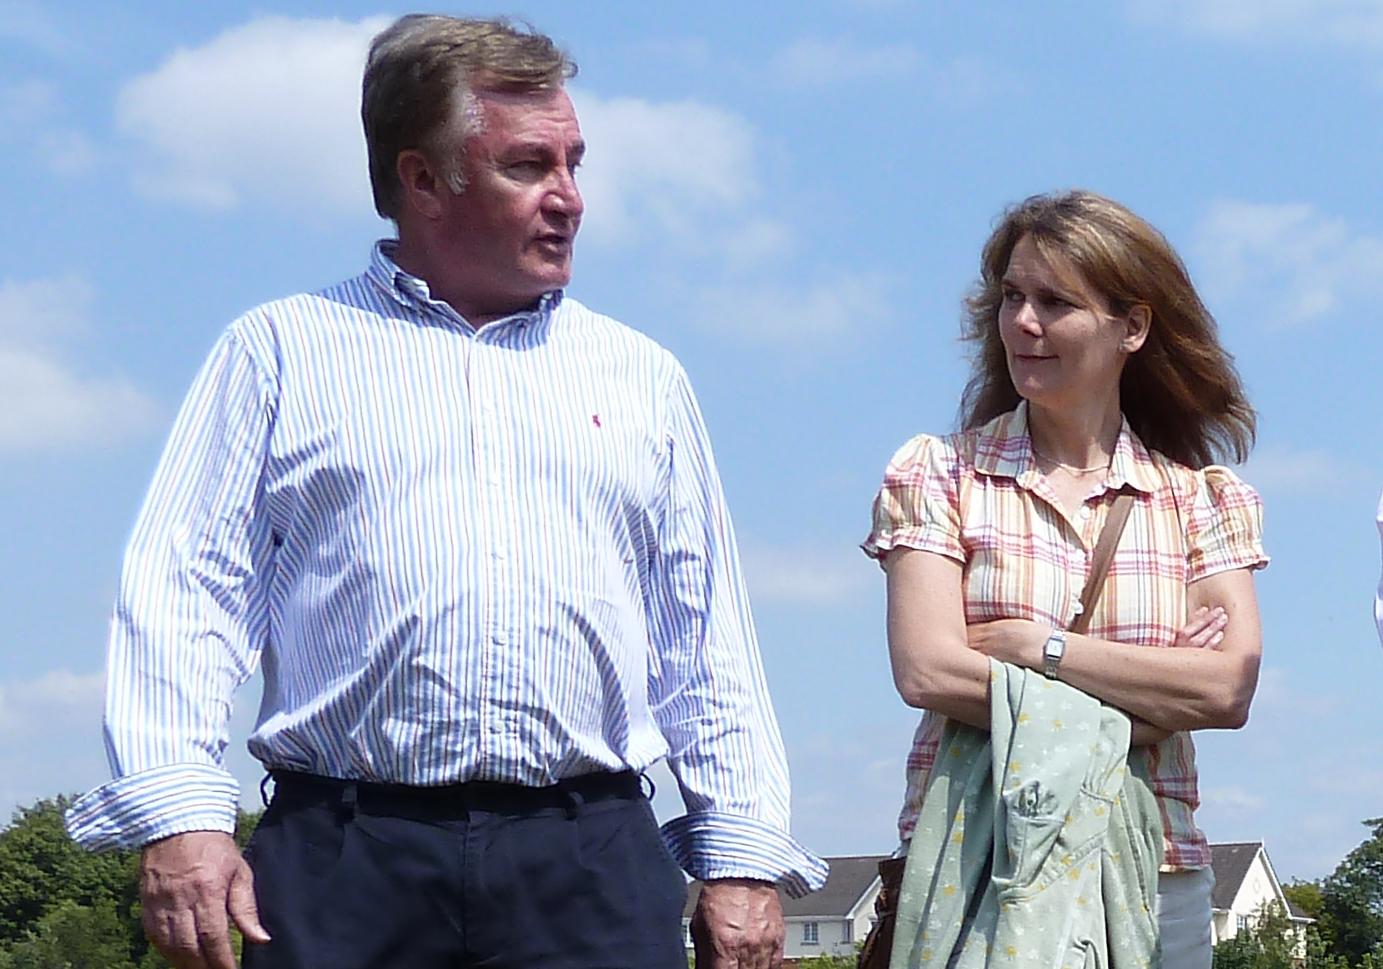 Patrick McKinley and Lynn Gatherer